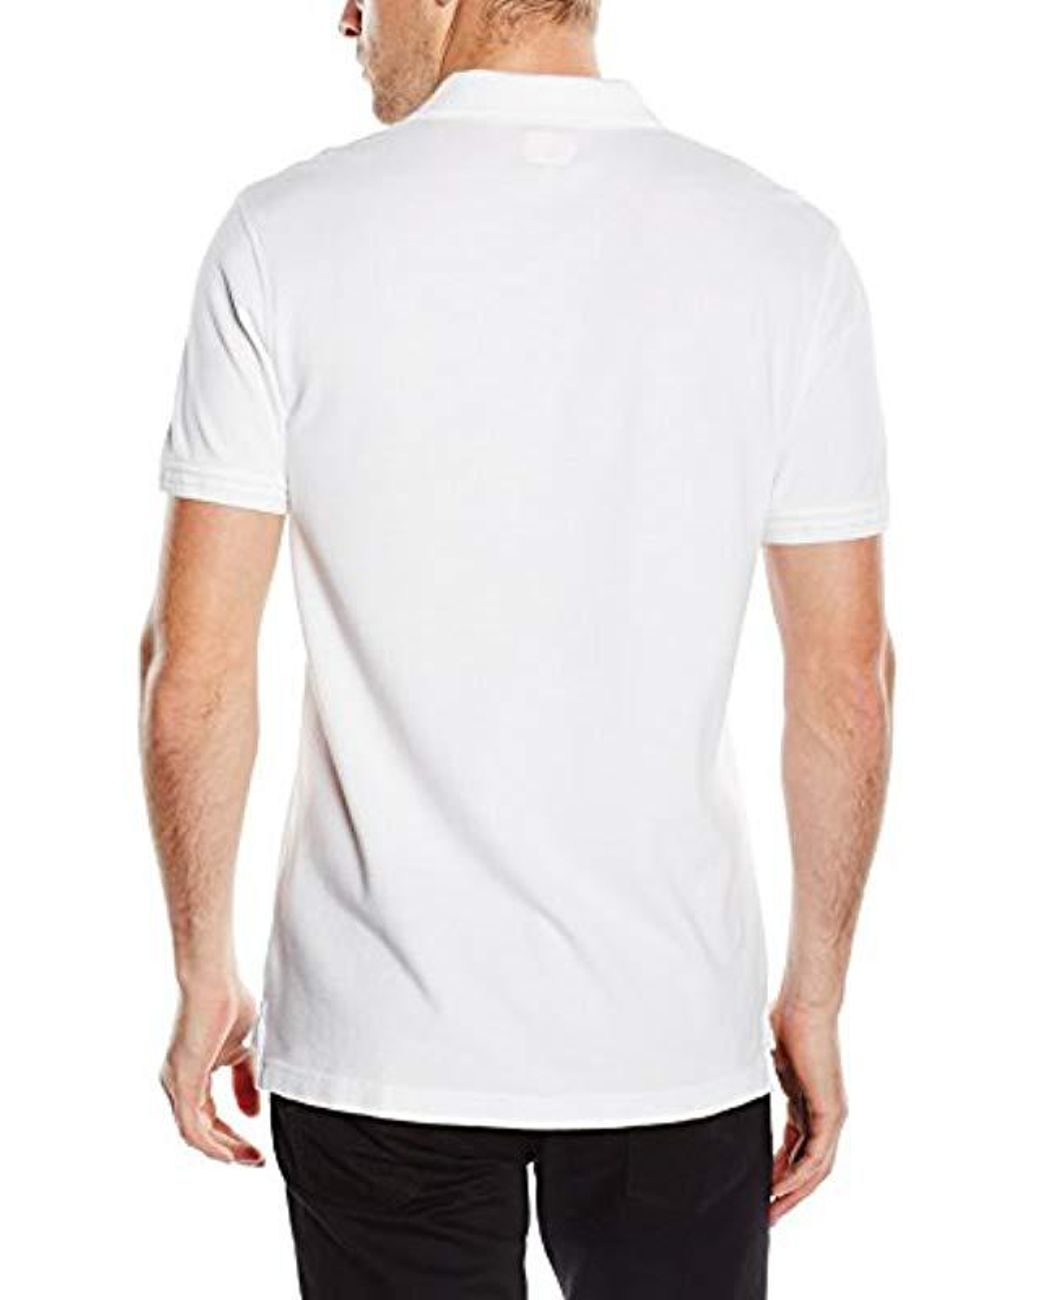 Blanc Homme Pour Levi's Coloris Lyst Housemark Polo En uPkXZi